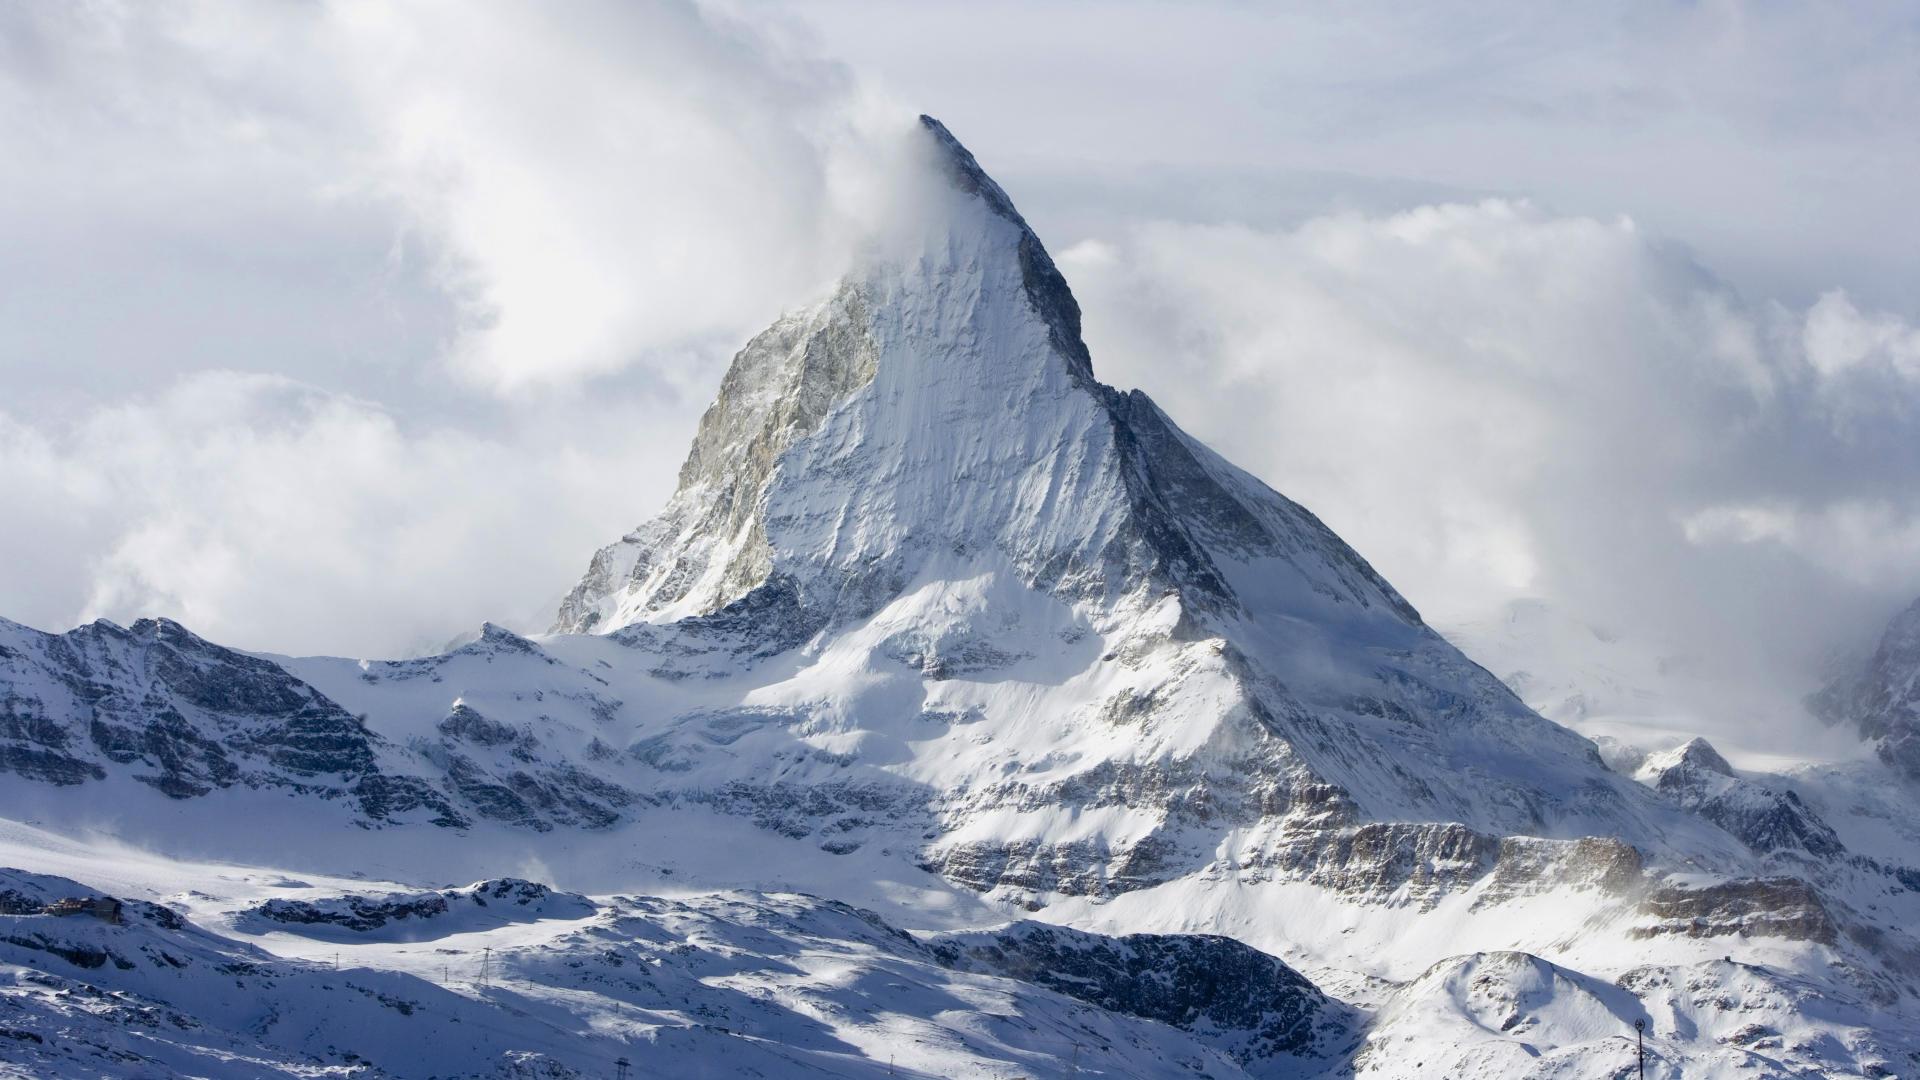 Wallpaper Mount Everest Mountain Top Landscape Snow 1920x1080